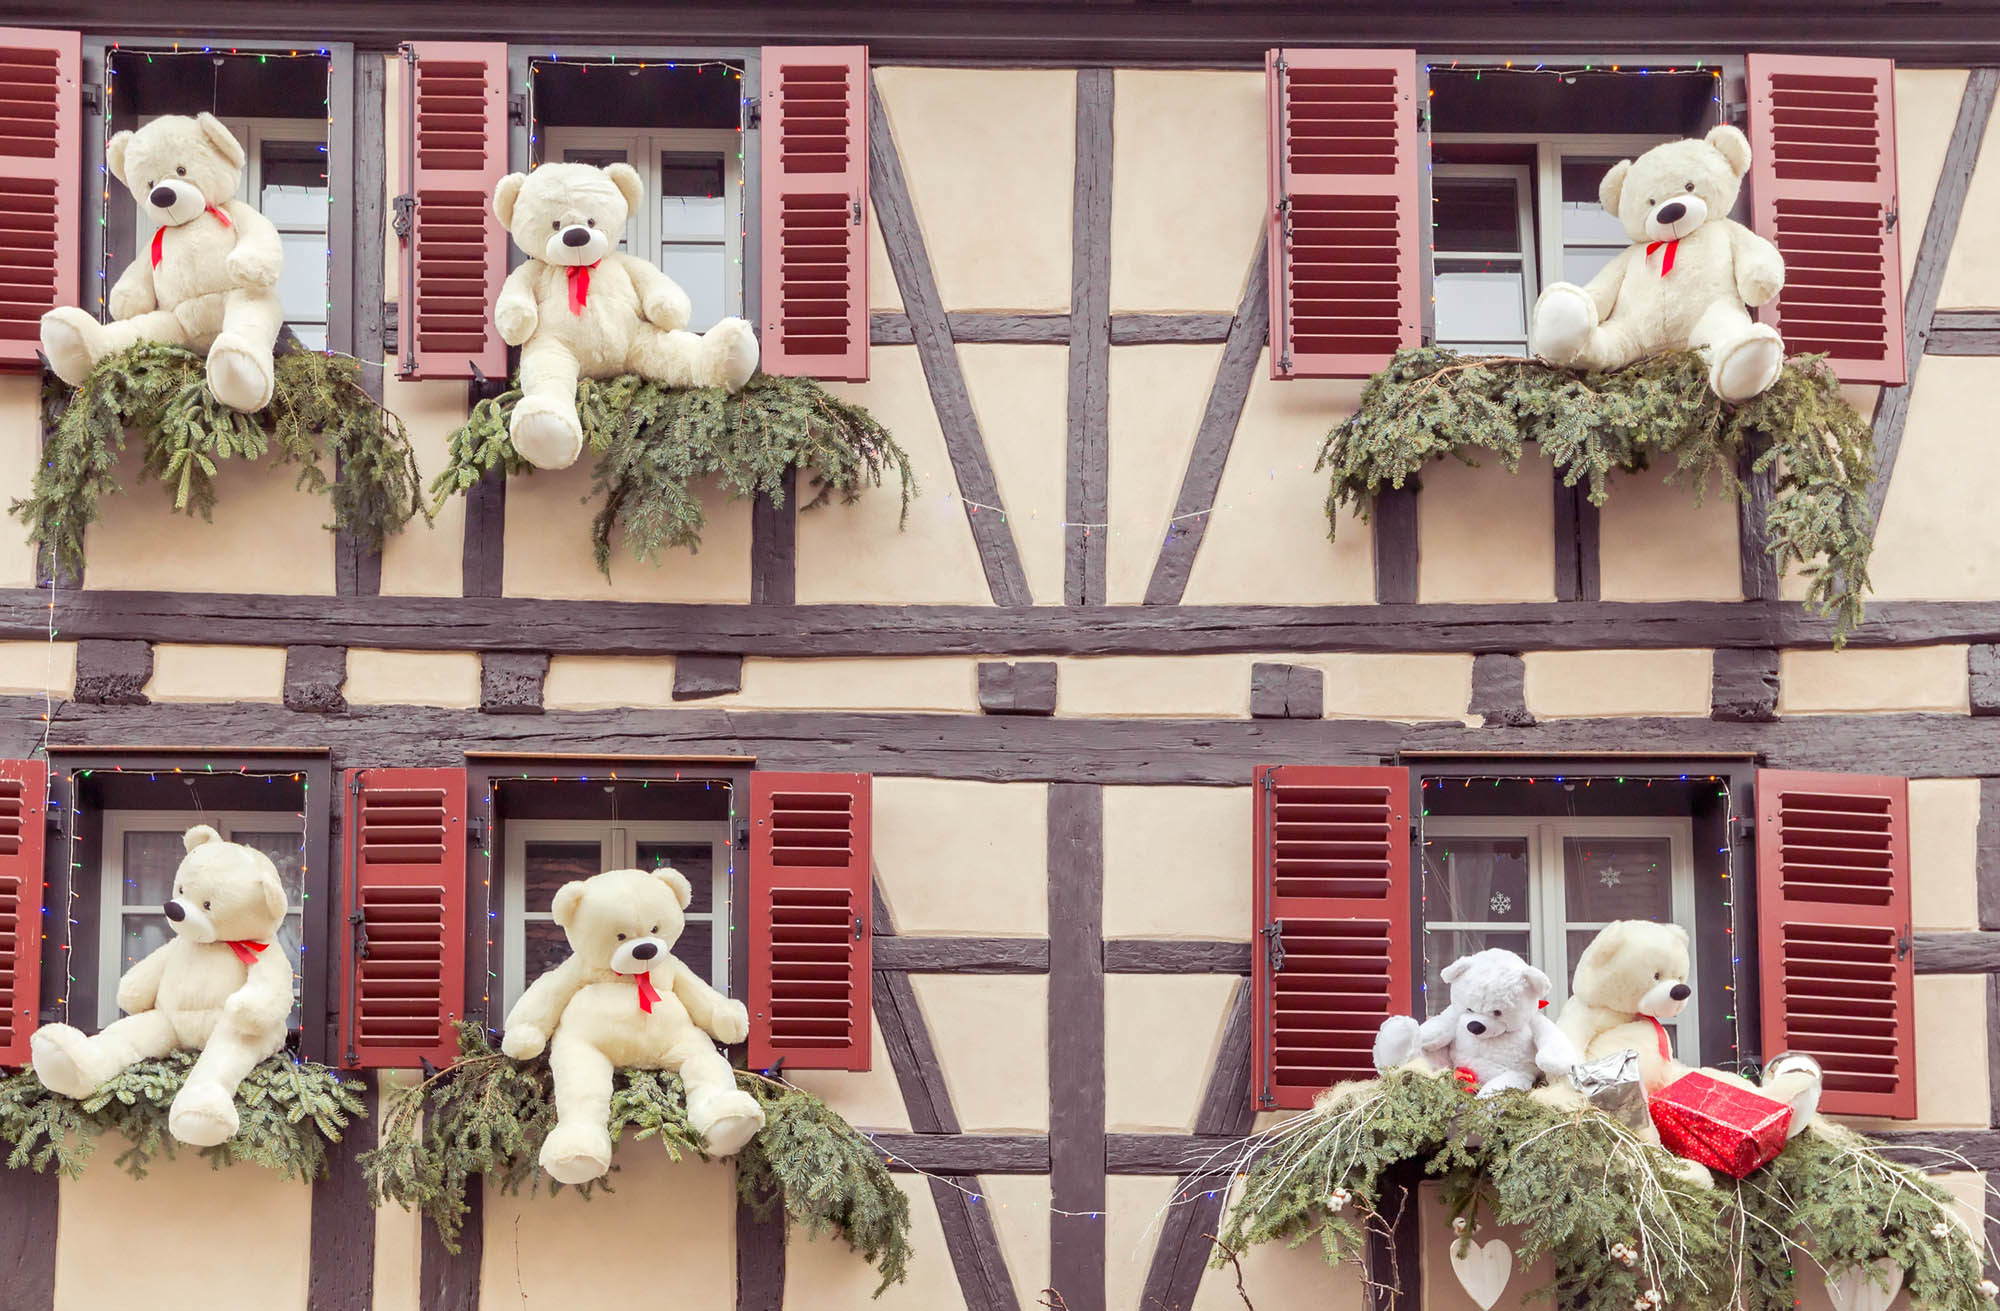 Noel_colmar_decorations_grand_rue_photo_AdobeStock_pillerss